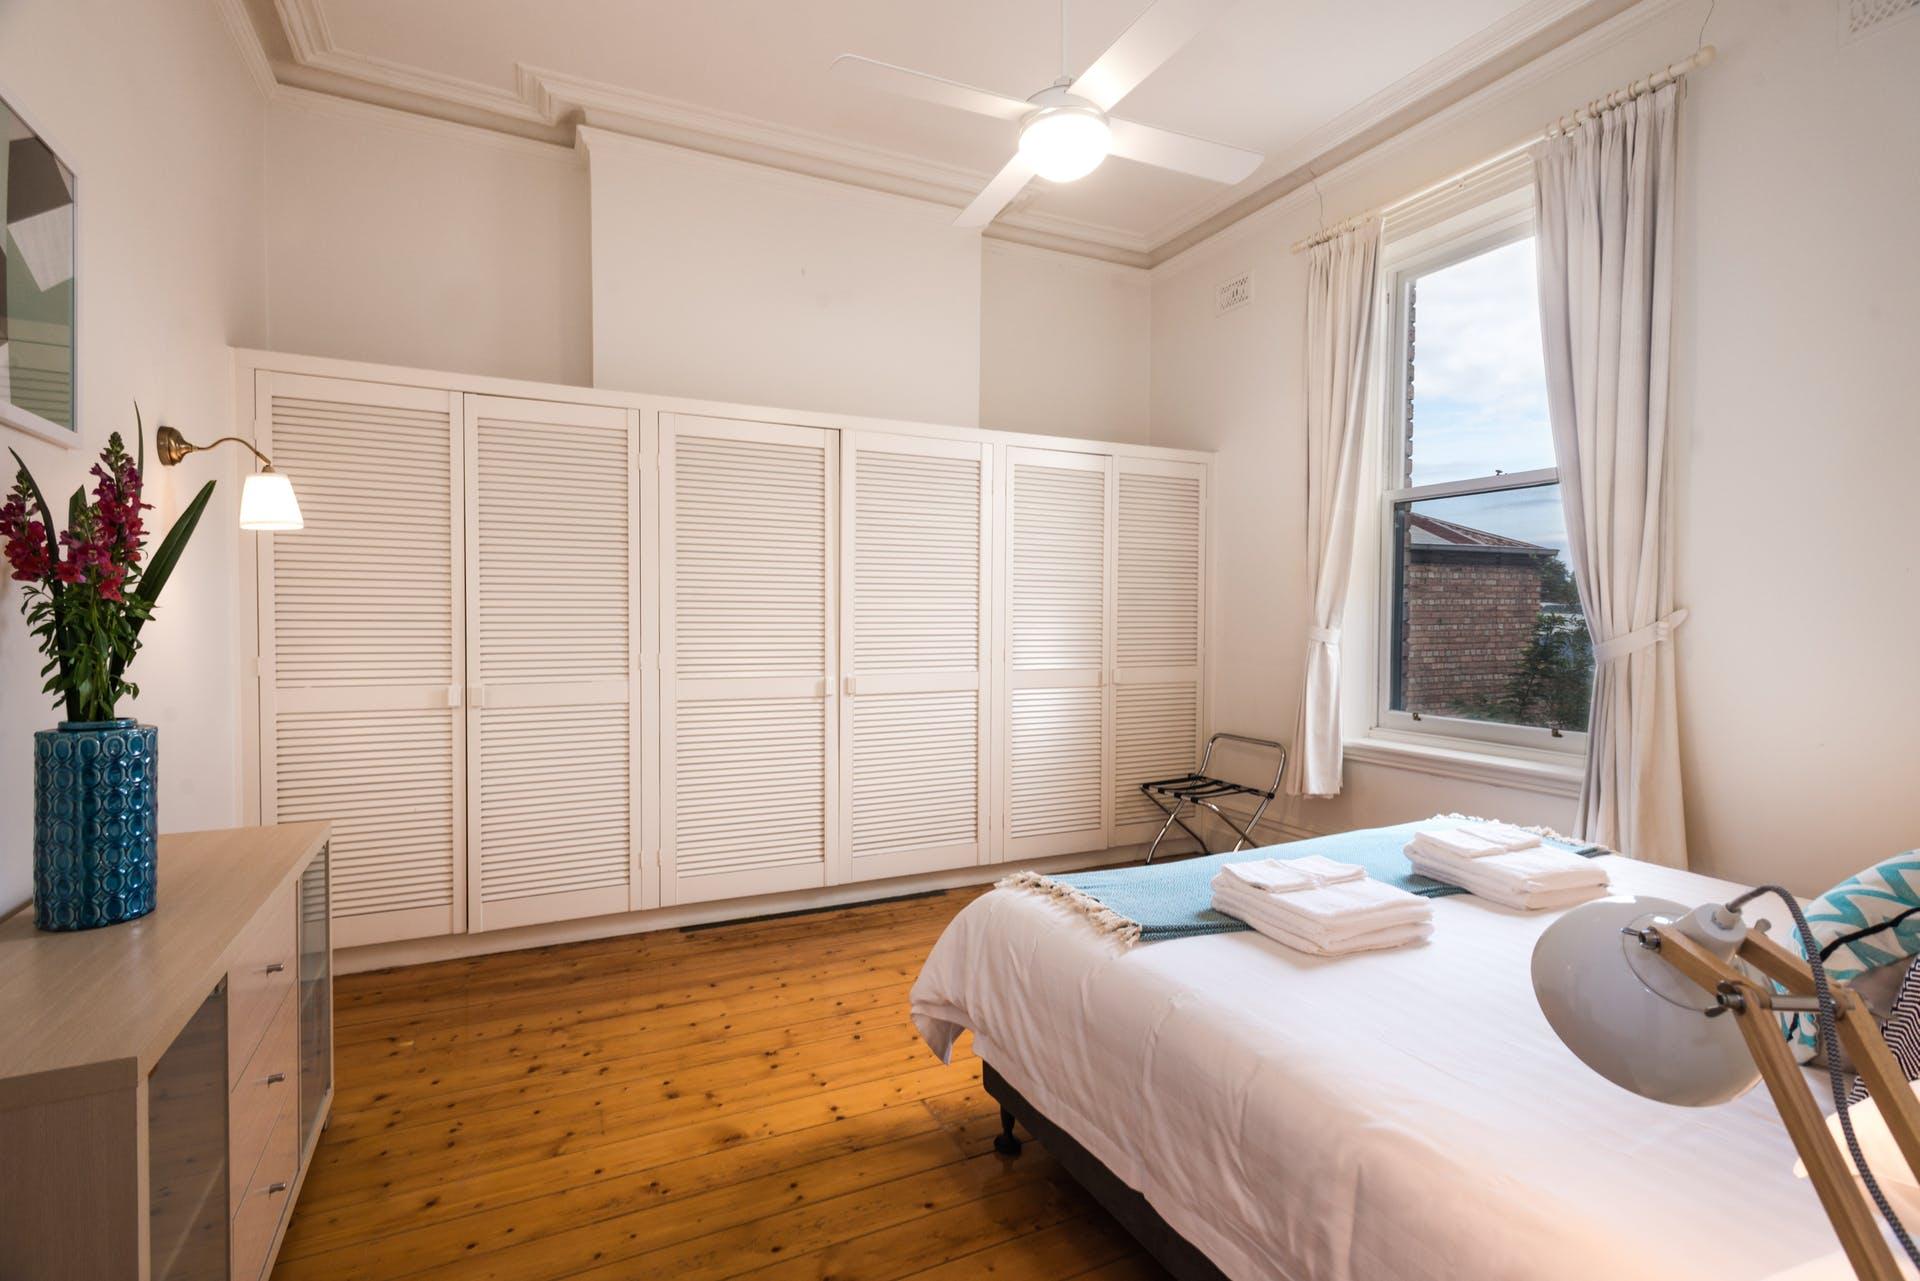 601-king-street-west-melbourne-student-accommodation-Melbourne-Bedroom-1-Unilodgers